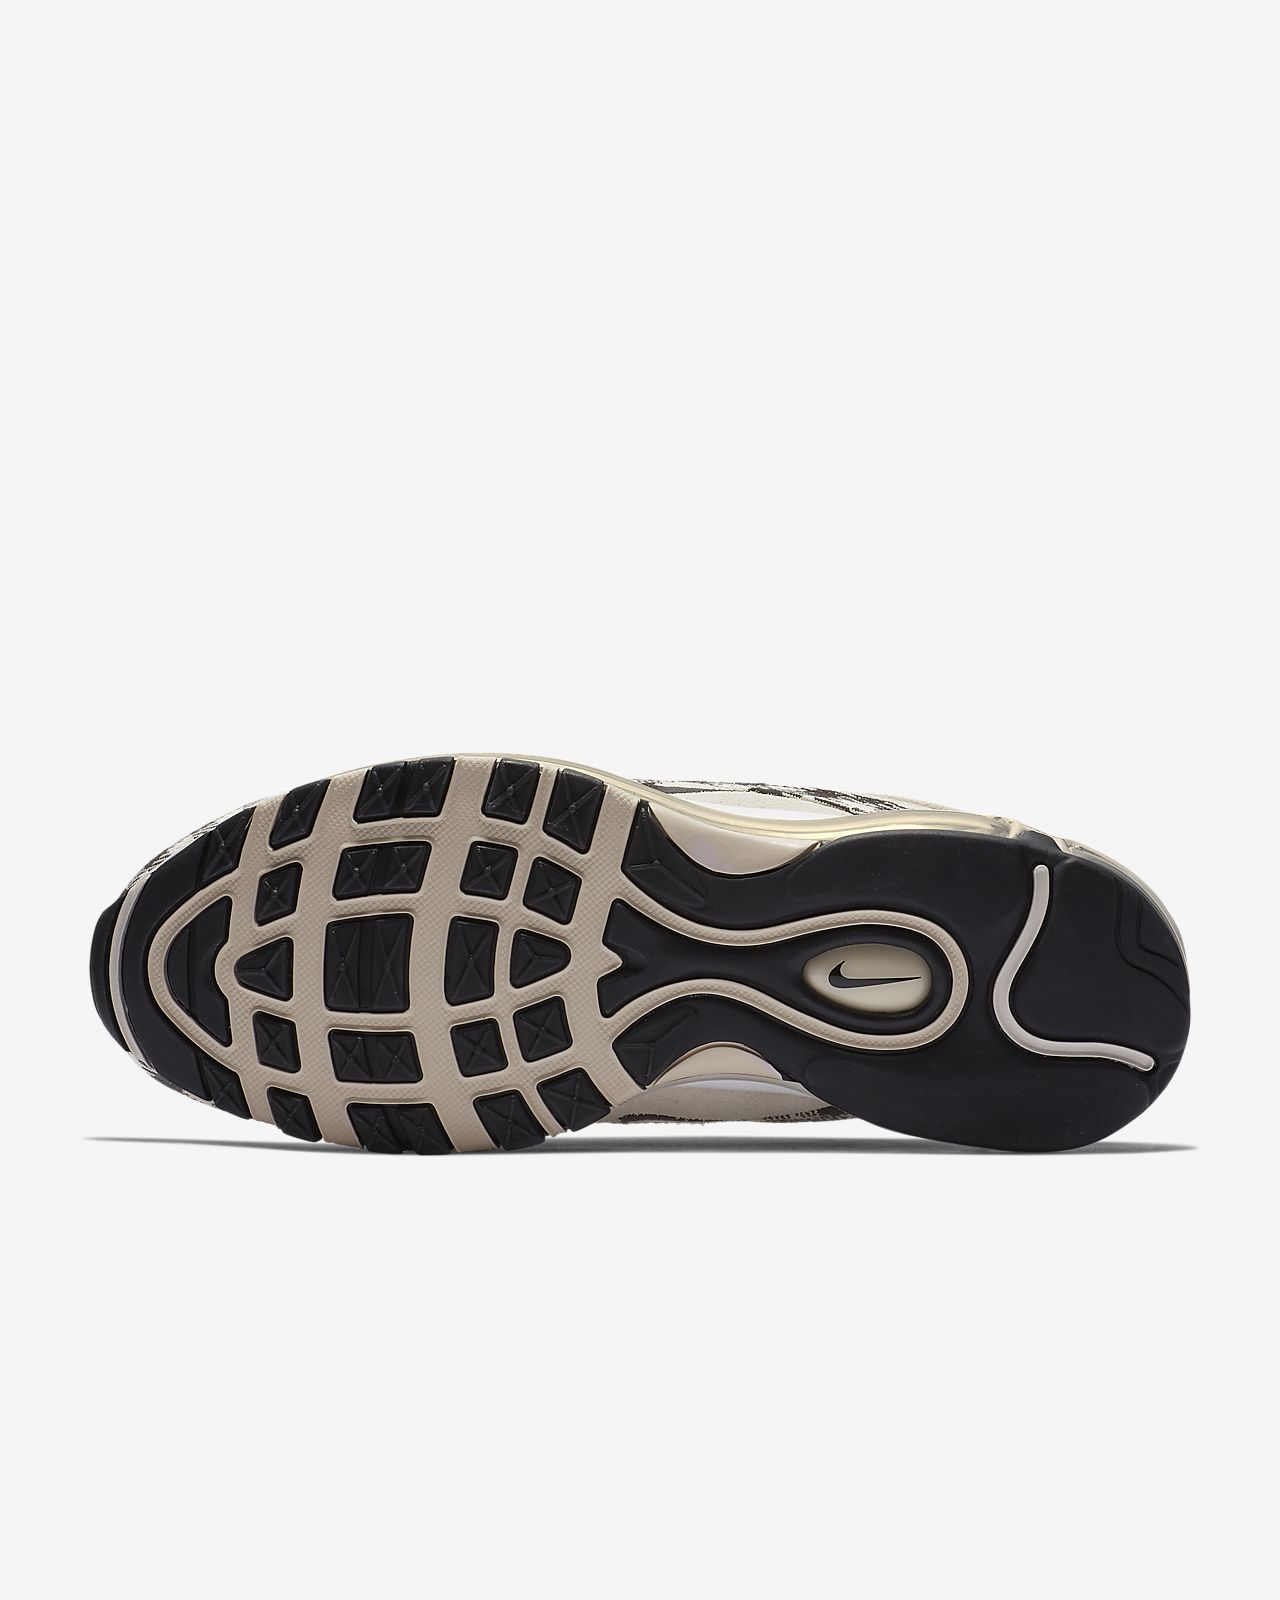 official photos 431d5 86f22 ... Nike Air Max 97 Premium Men s Shoe